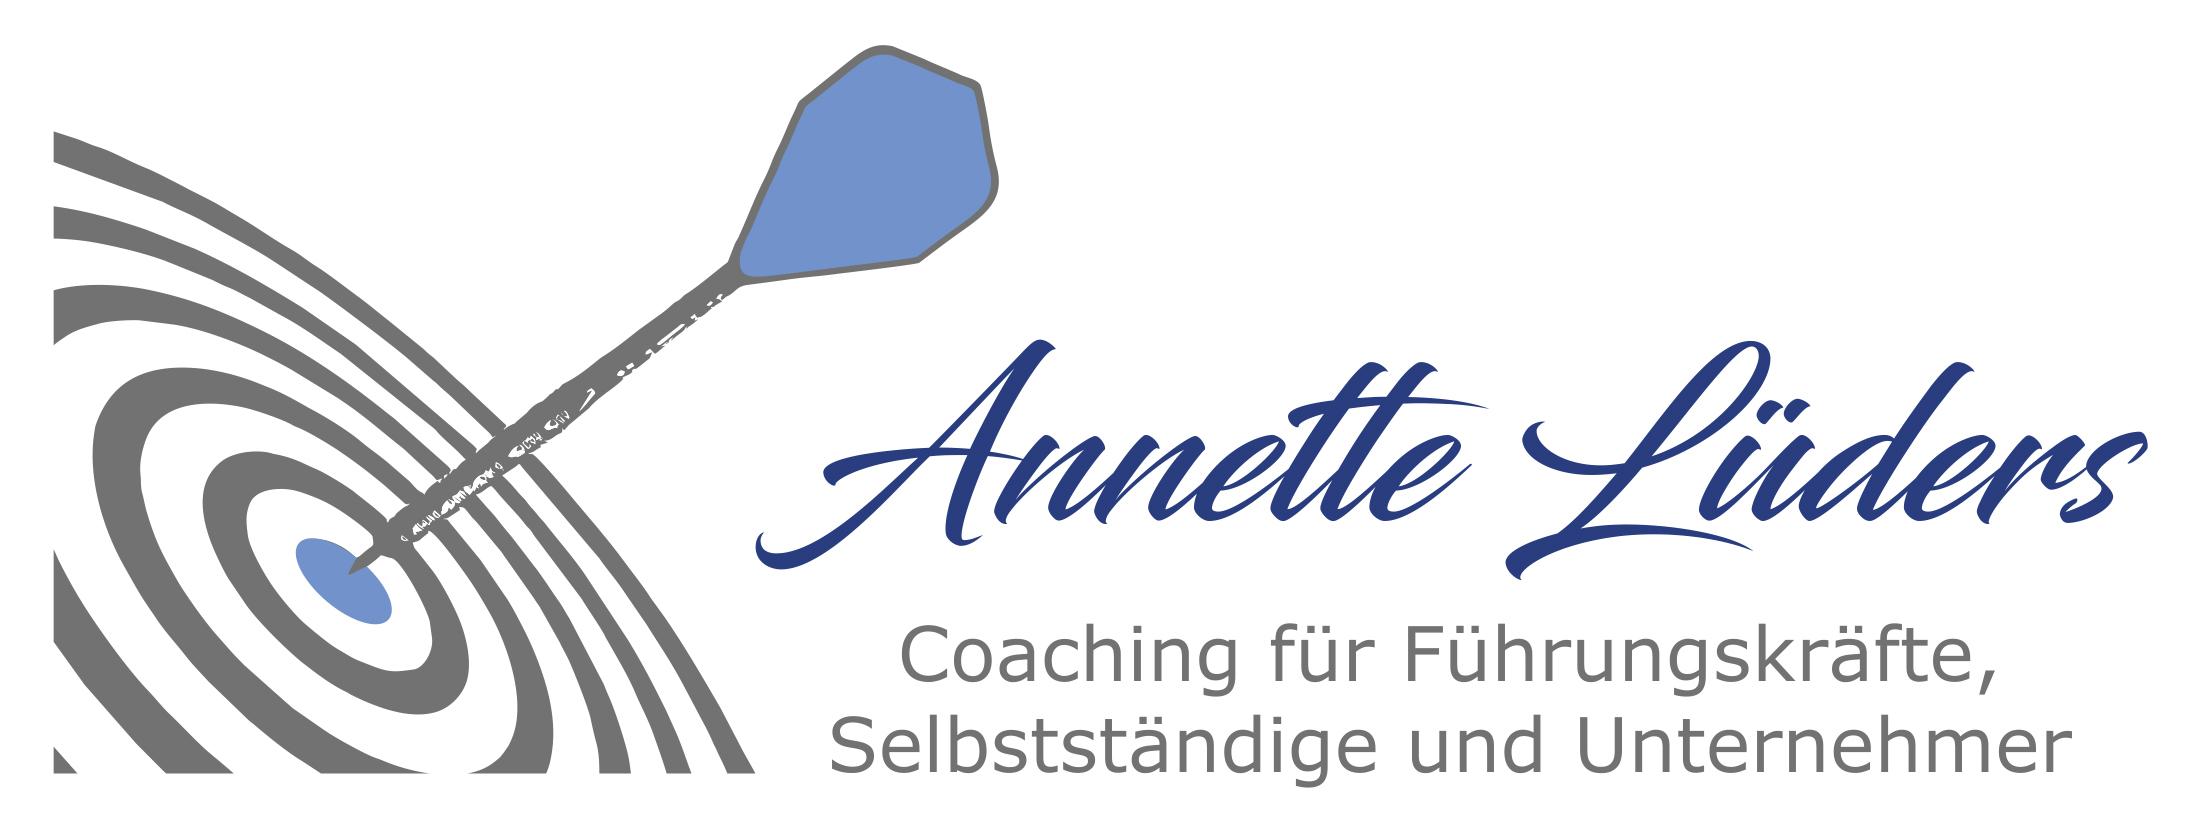 Annette Lüders